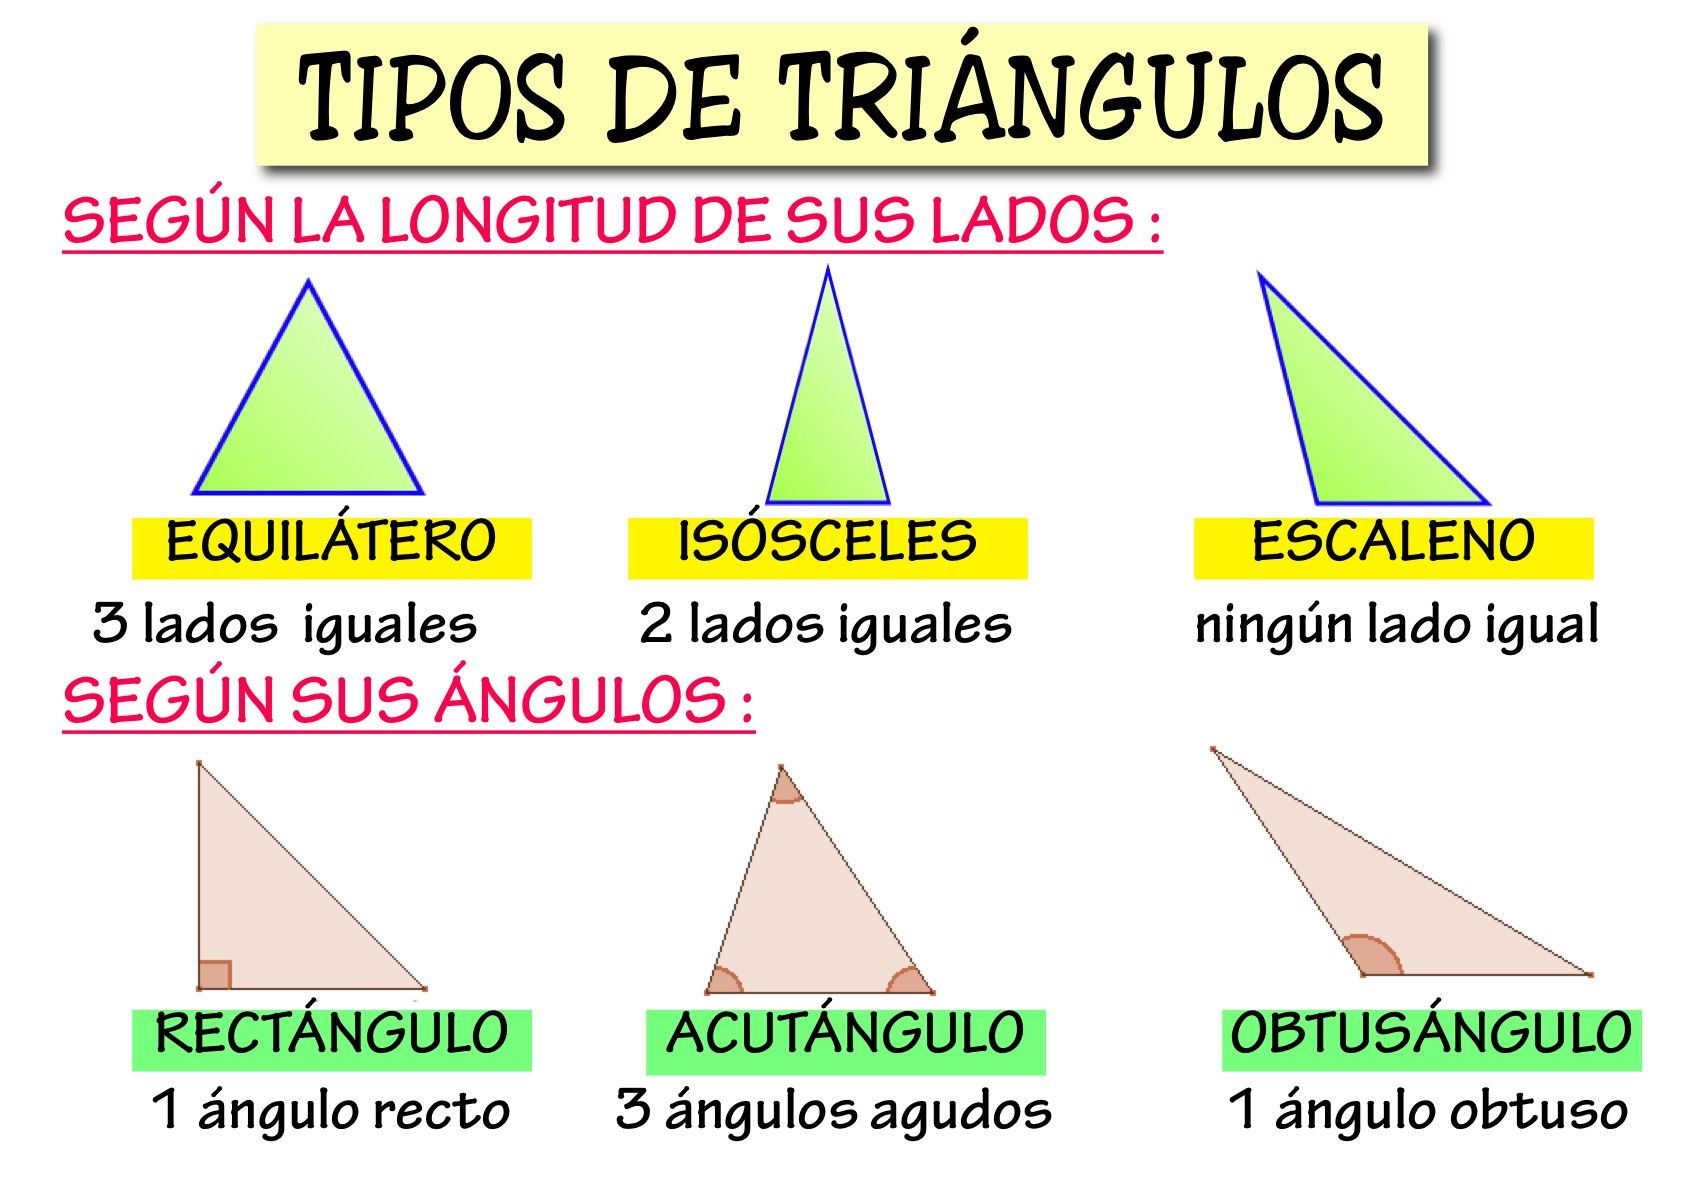 The best: clases de triangulos segun sus angulos yahoo dating